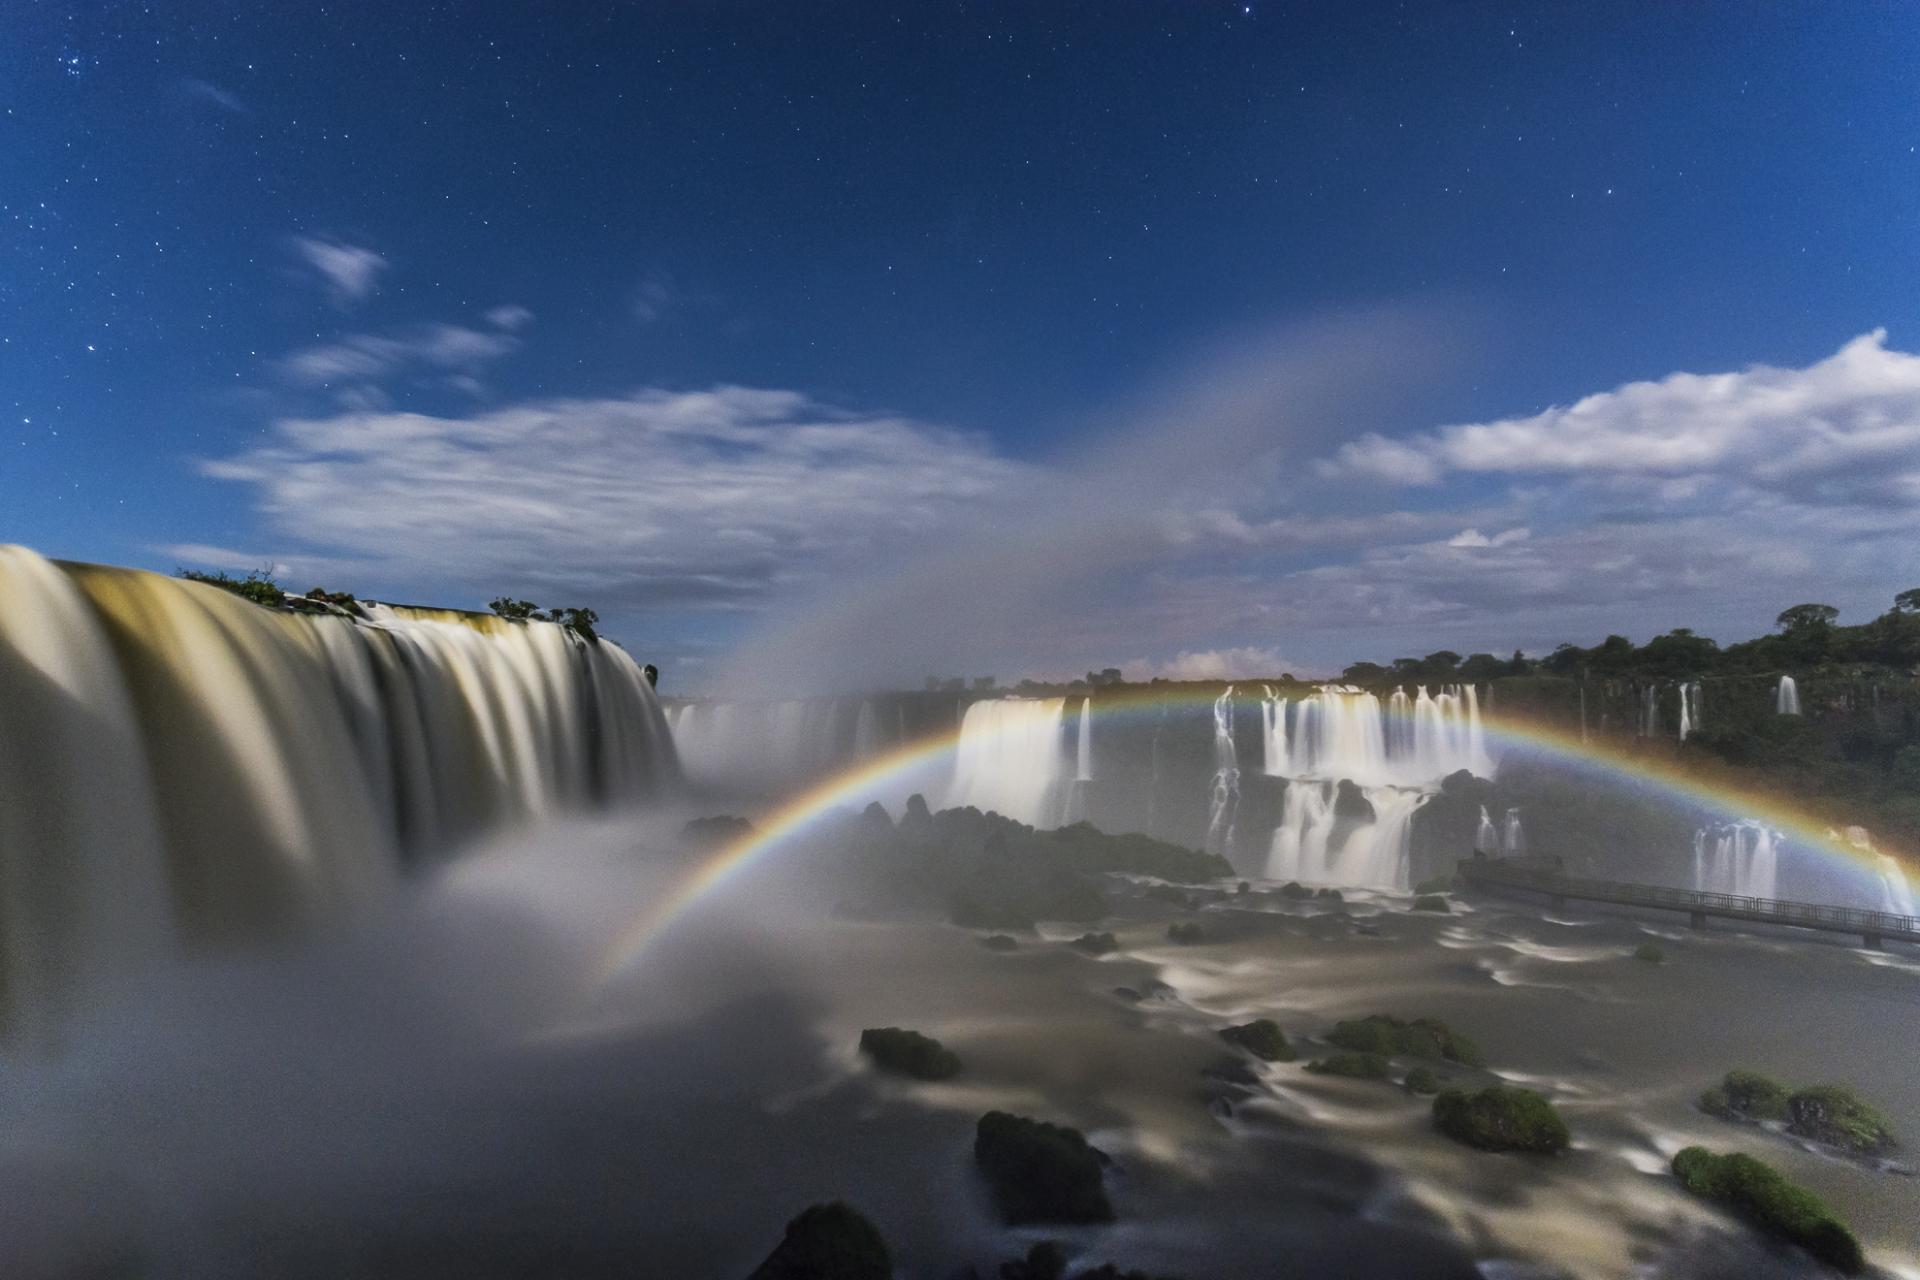 The impressive waterfalls of Foz do Iguacu